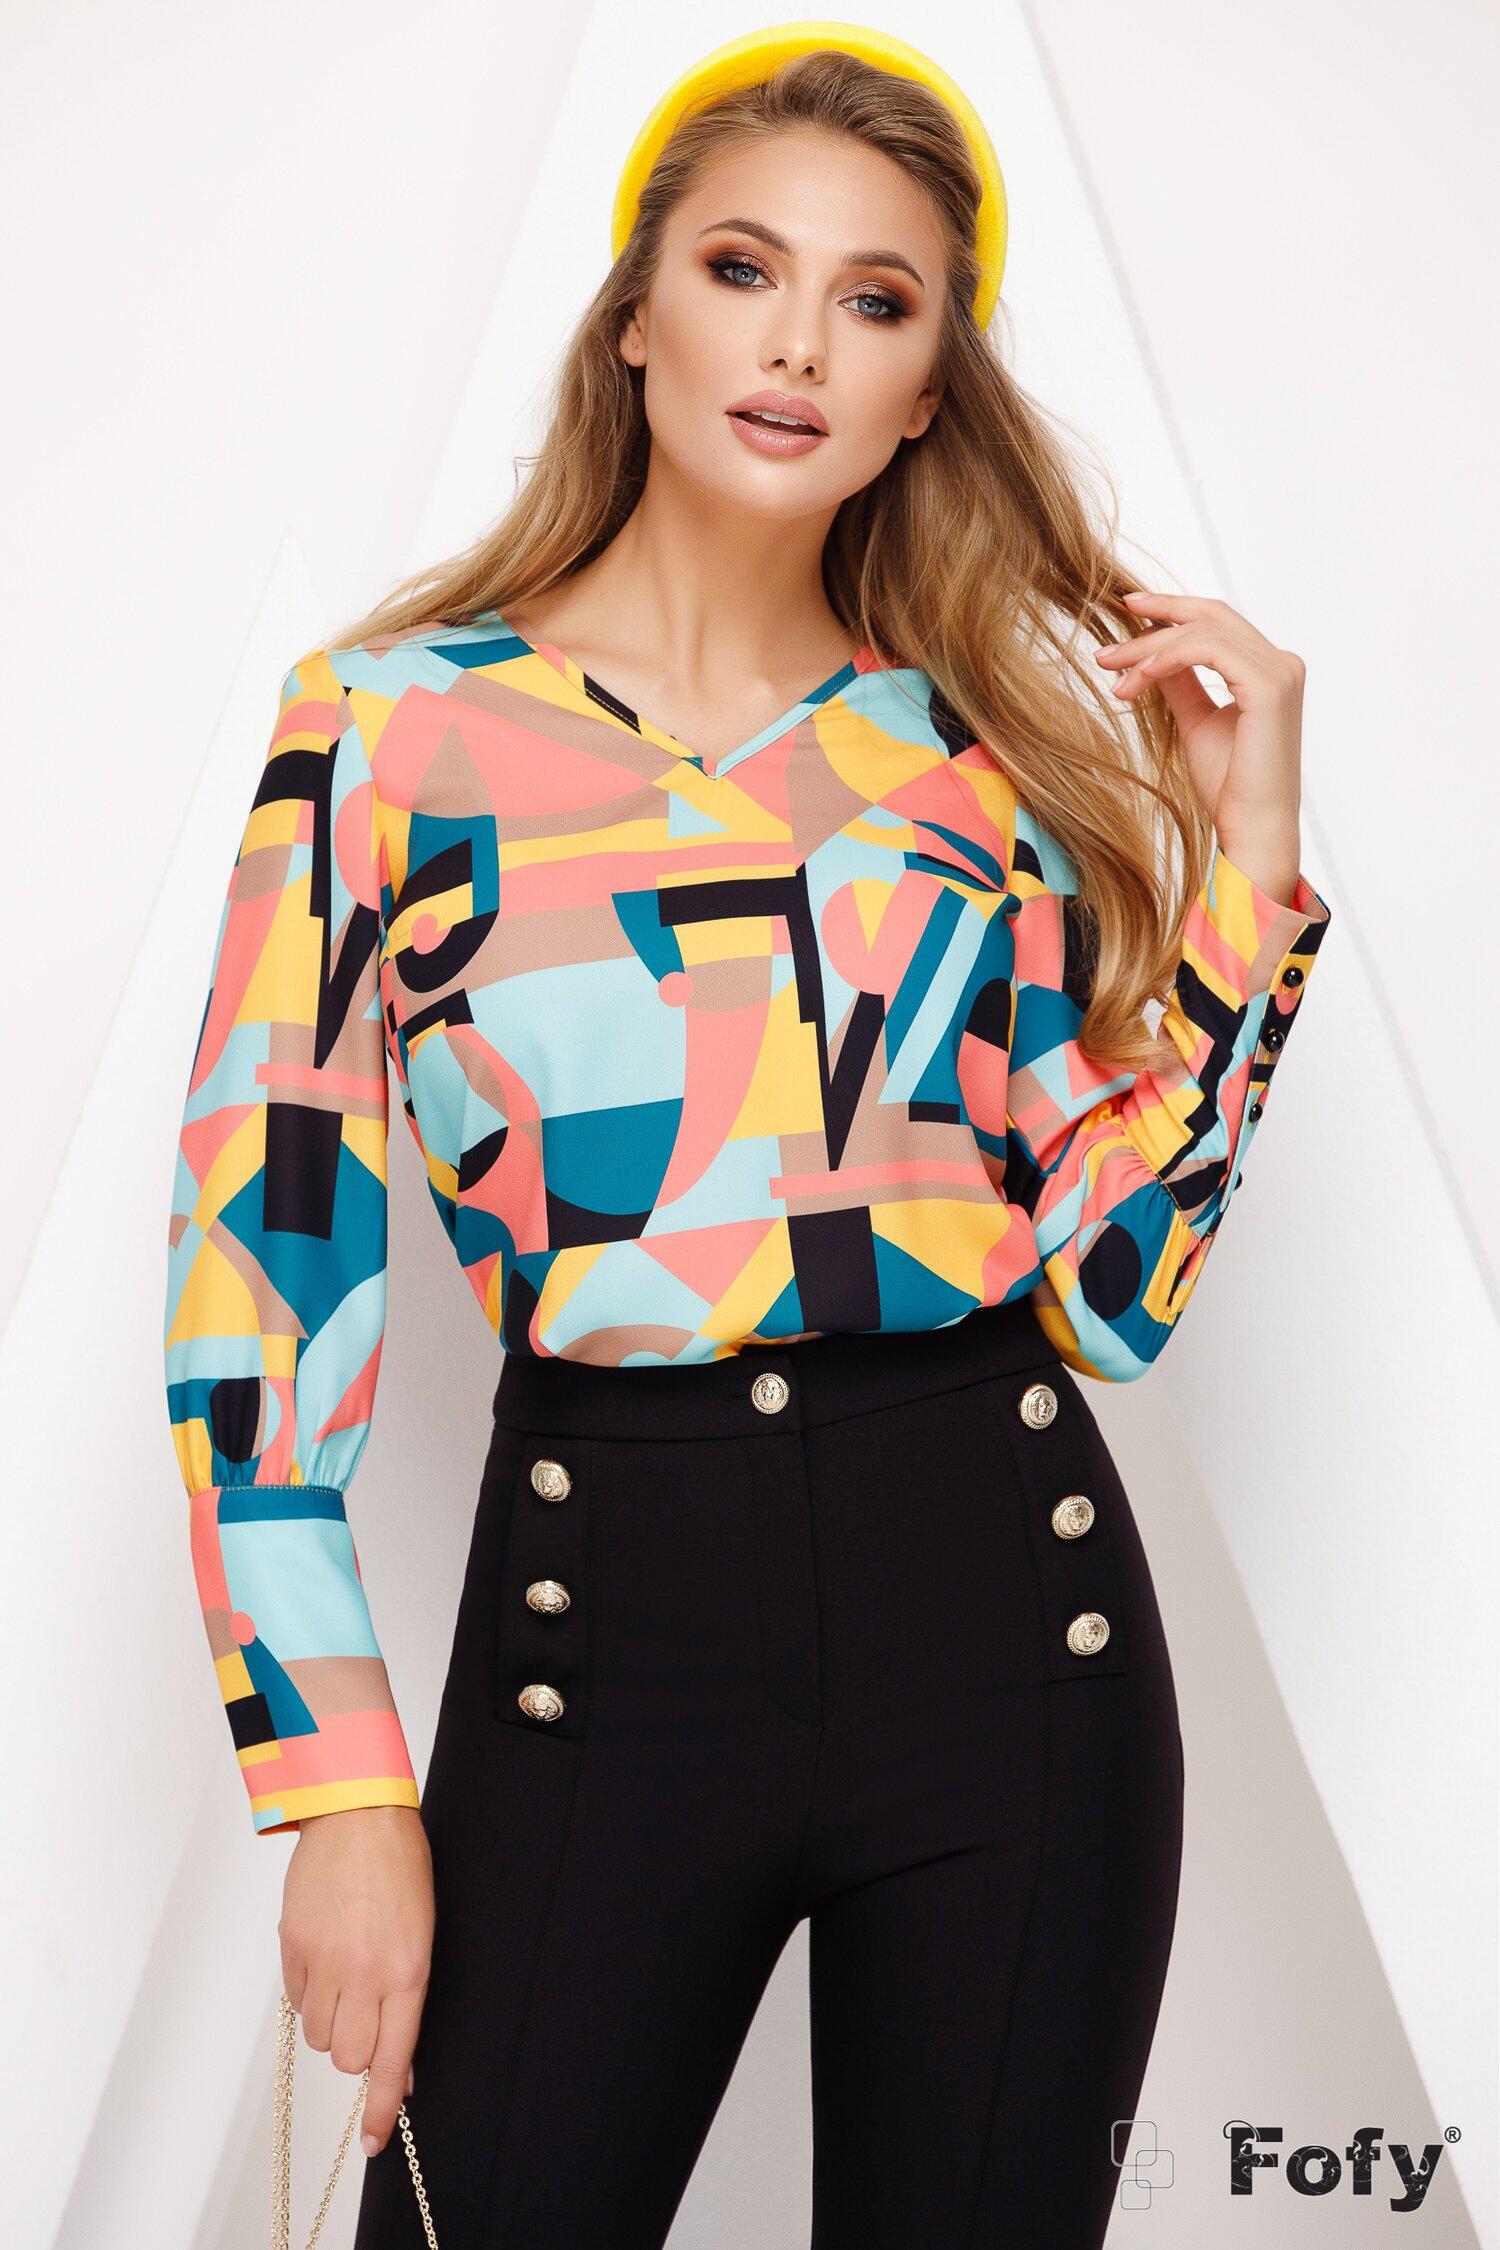 Bluza Fofy cu imprimeu grafic multicolor si esarfa la gat